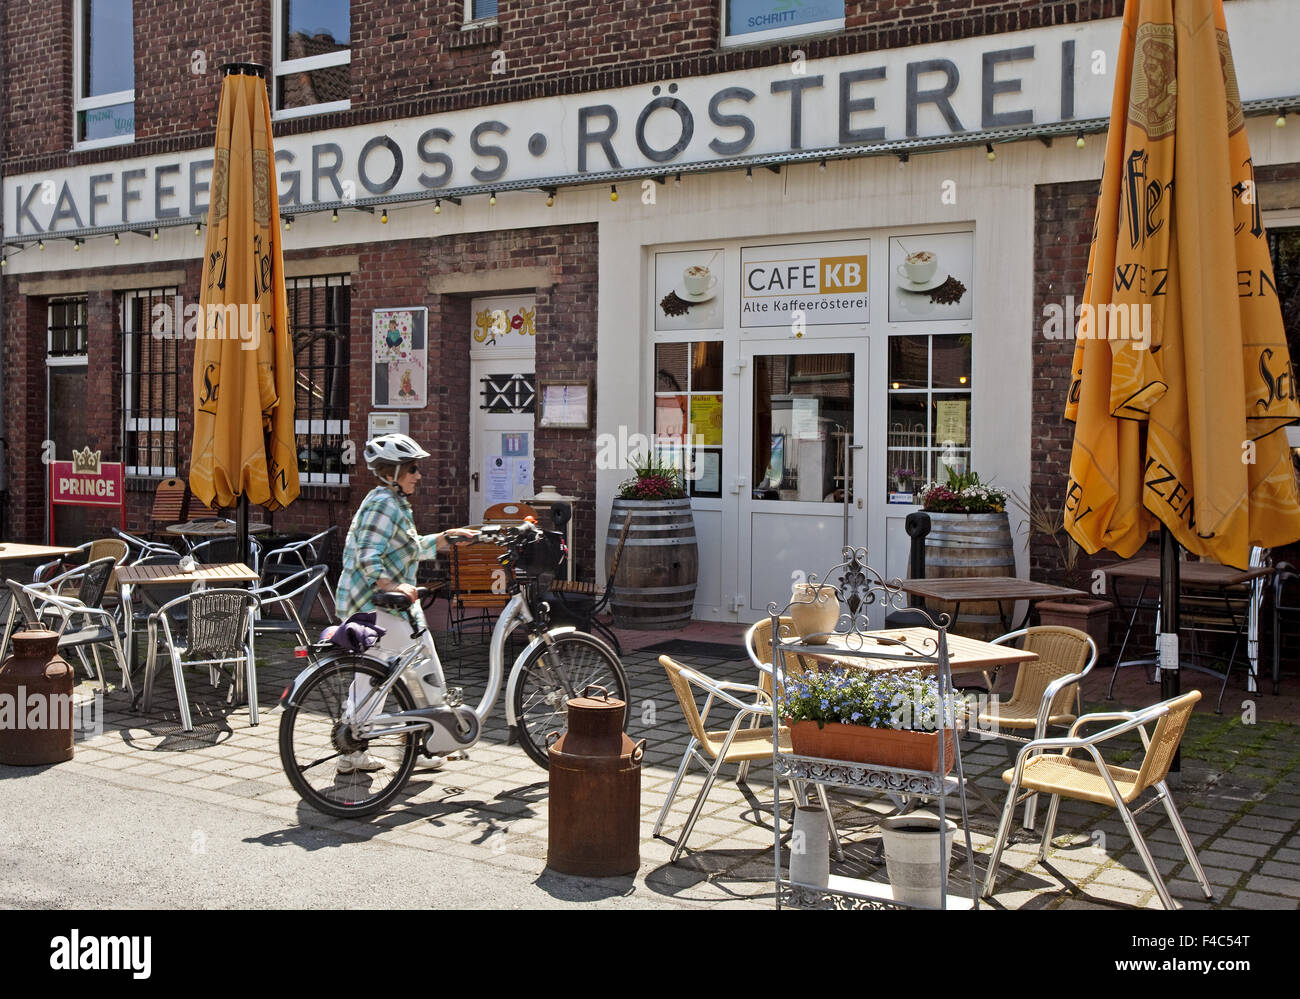 Coffee roasting, Luenen, Germany - Stock Image